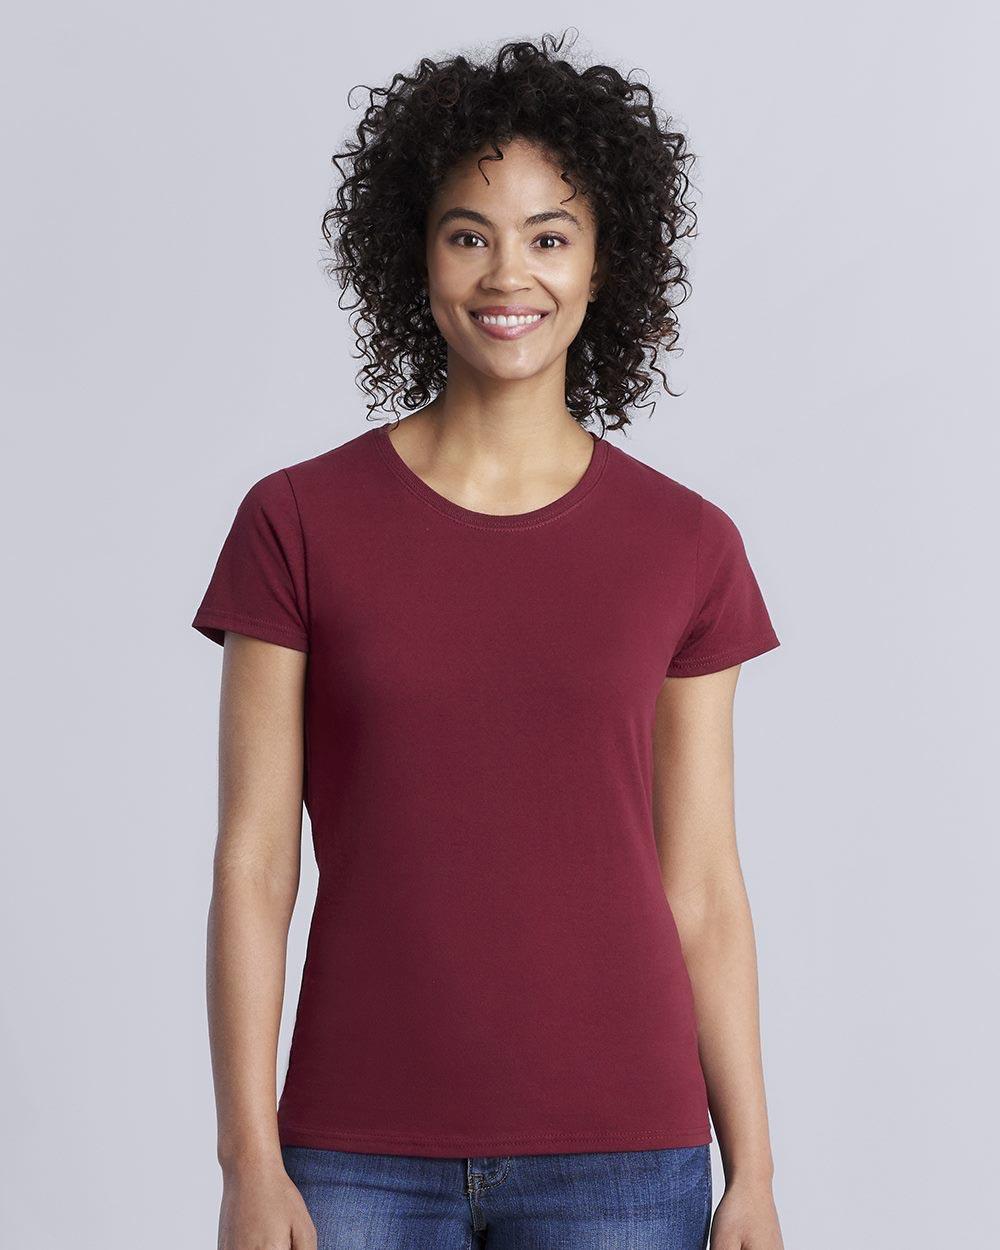 Gildan 5000L - Heavy Cotton Women's T-Shirt